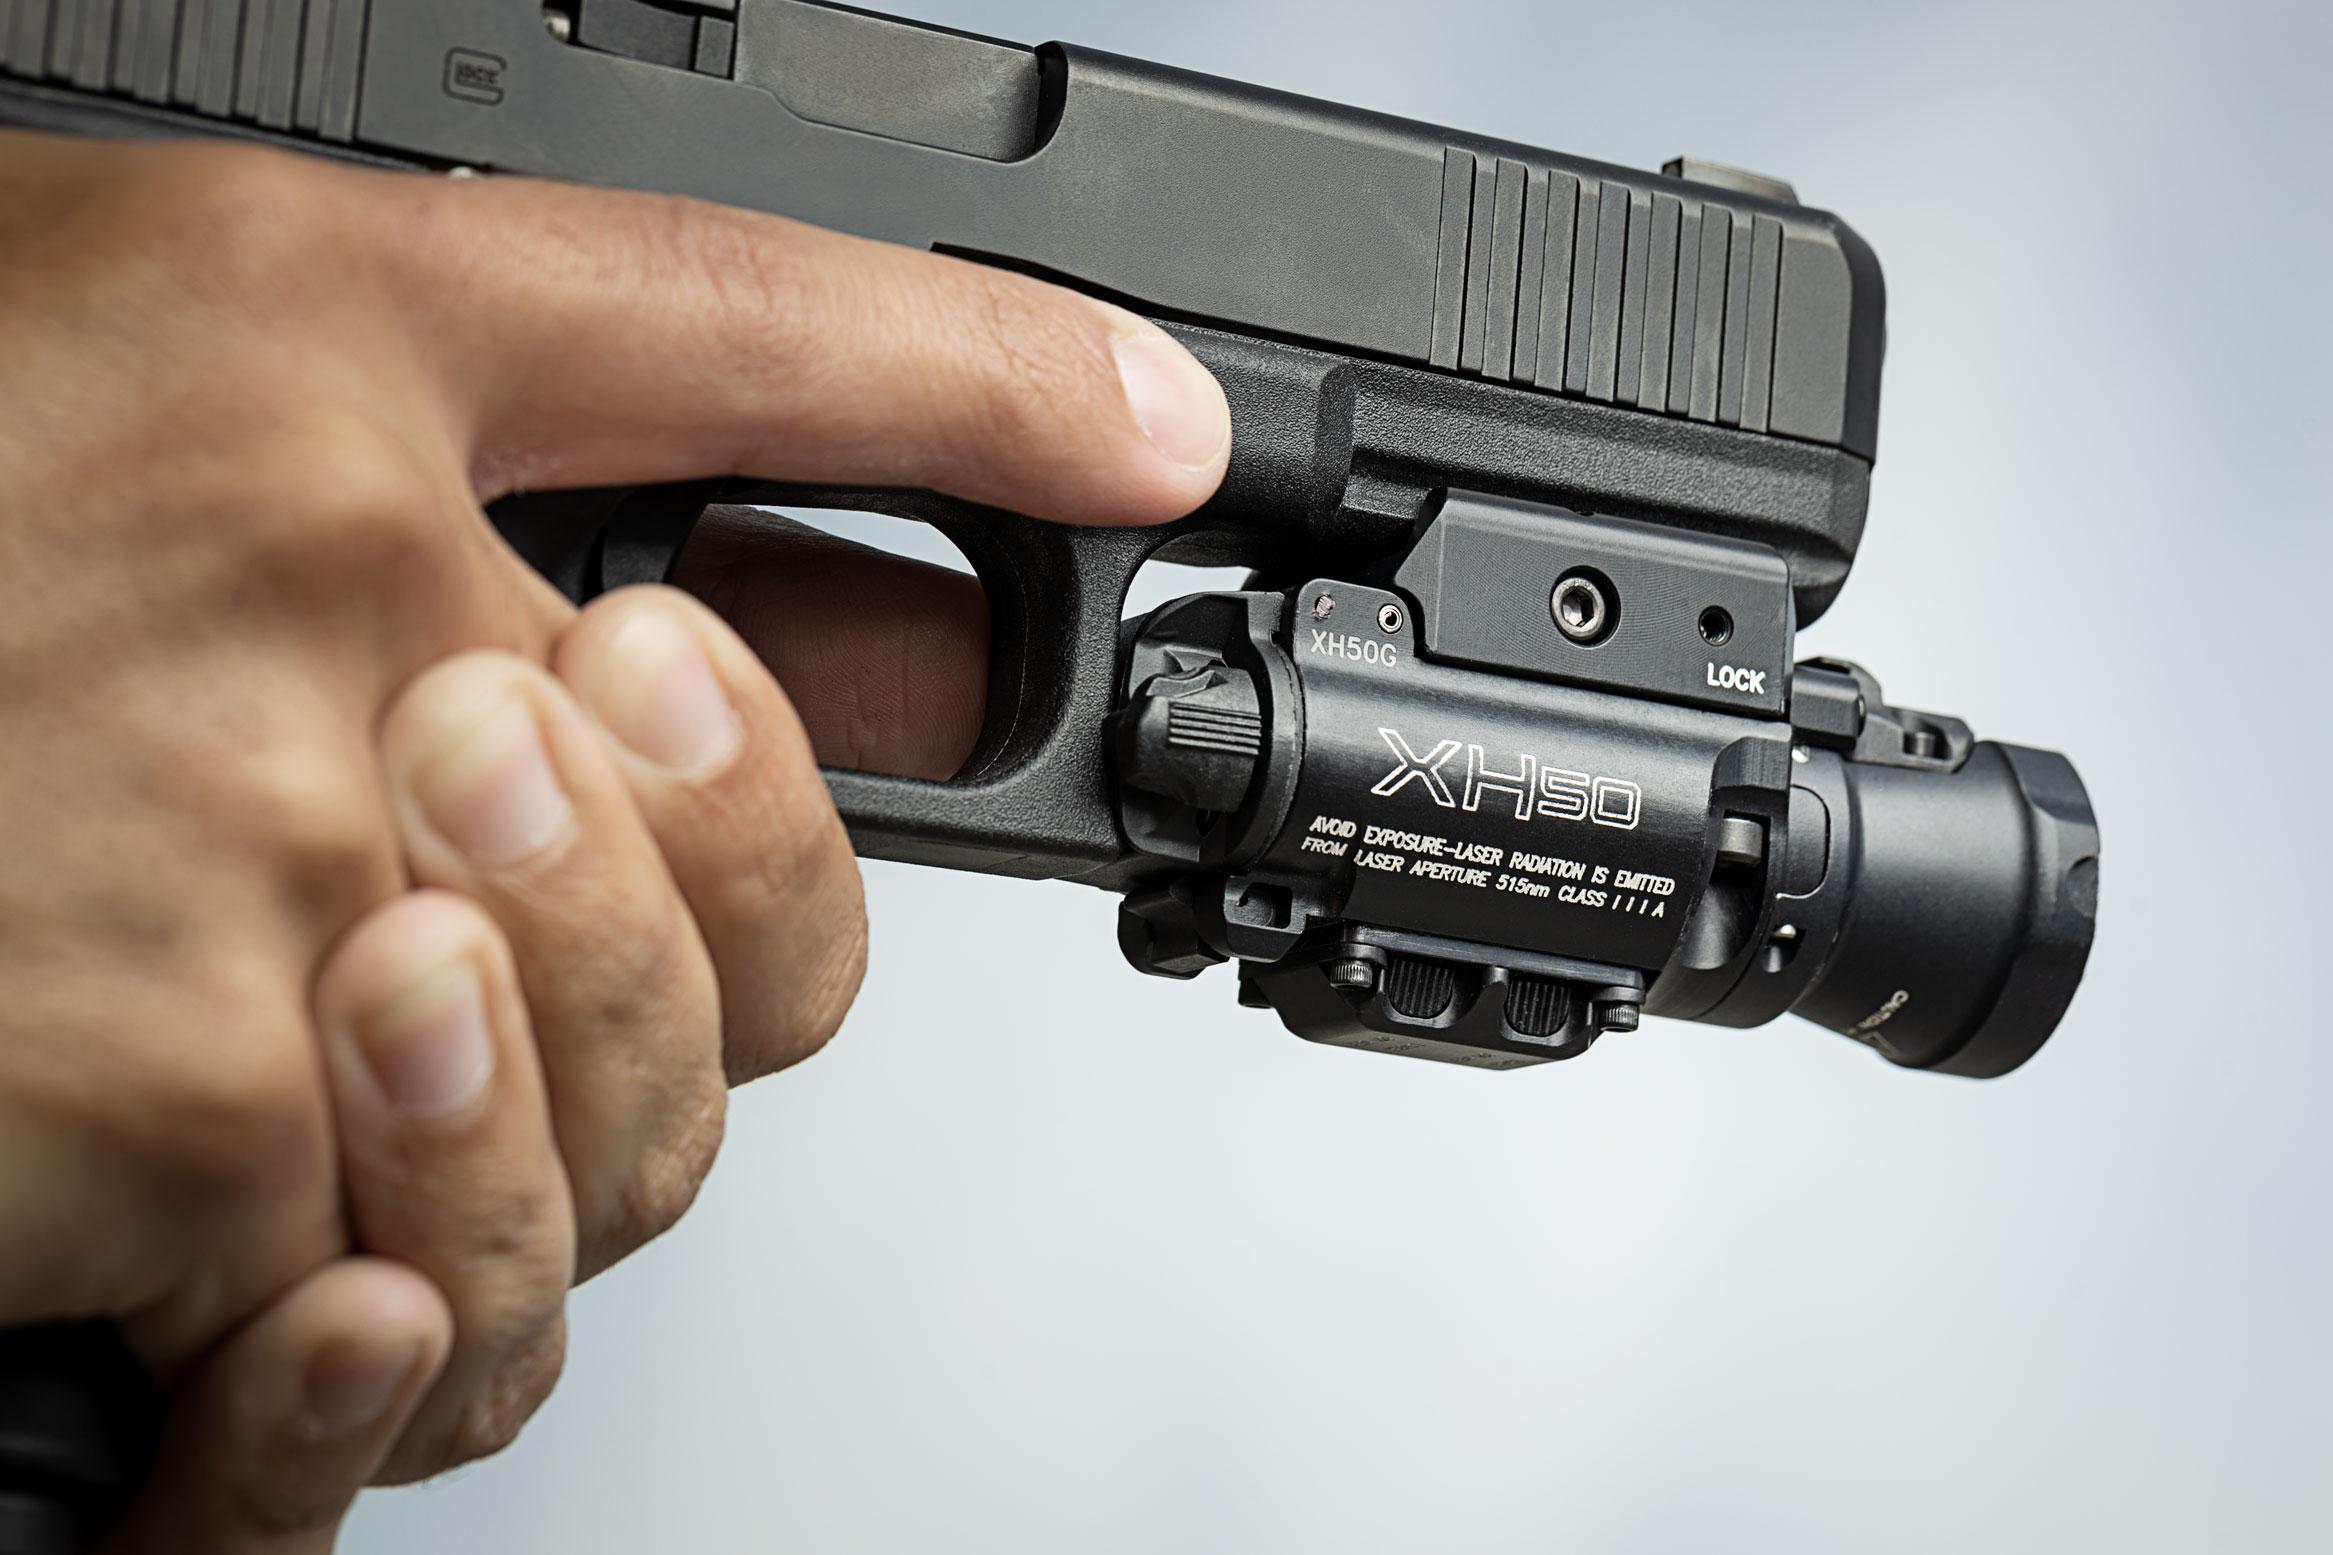 surefire xh50 masterfire weaponlight pistol light and laser green laser